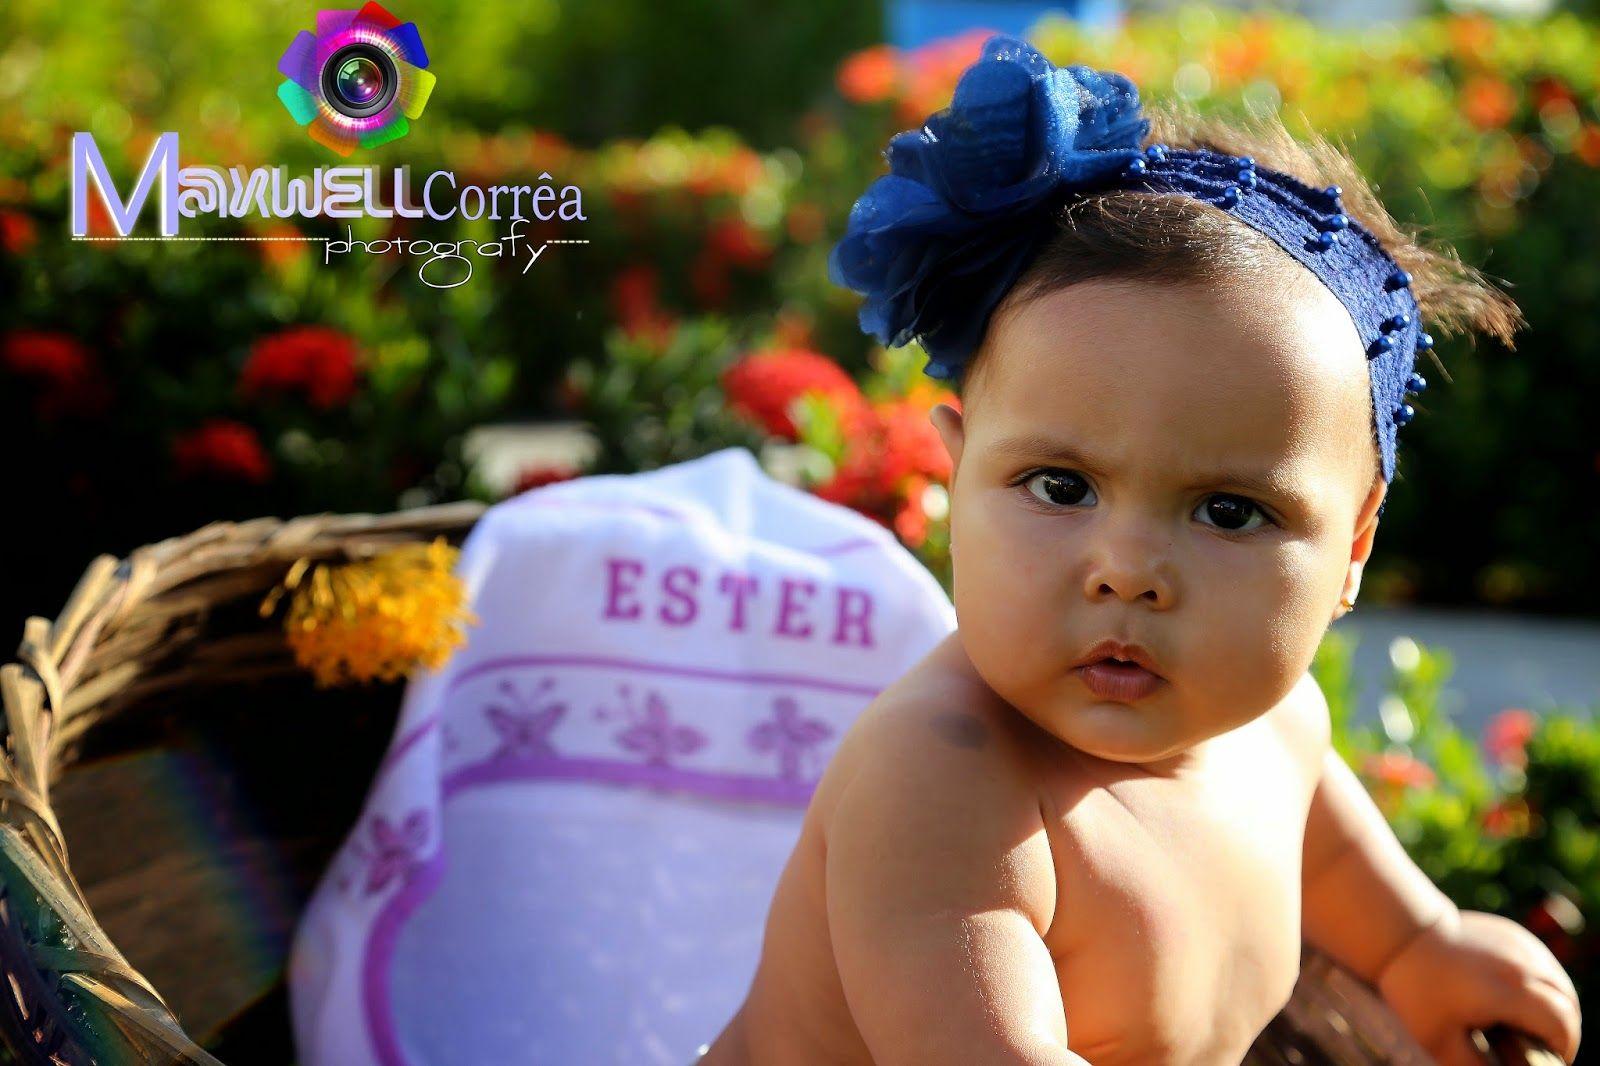 Maxwell Corrêa foto e video: Book infantil linda Ester 8 meses, parabéns pais pela princesa!